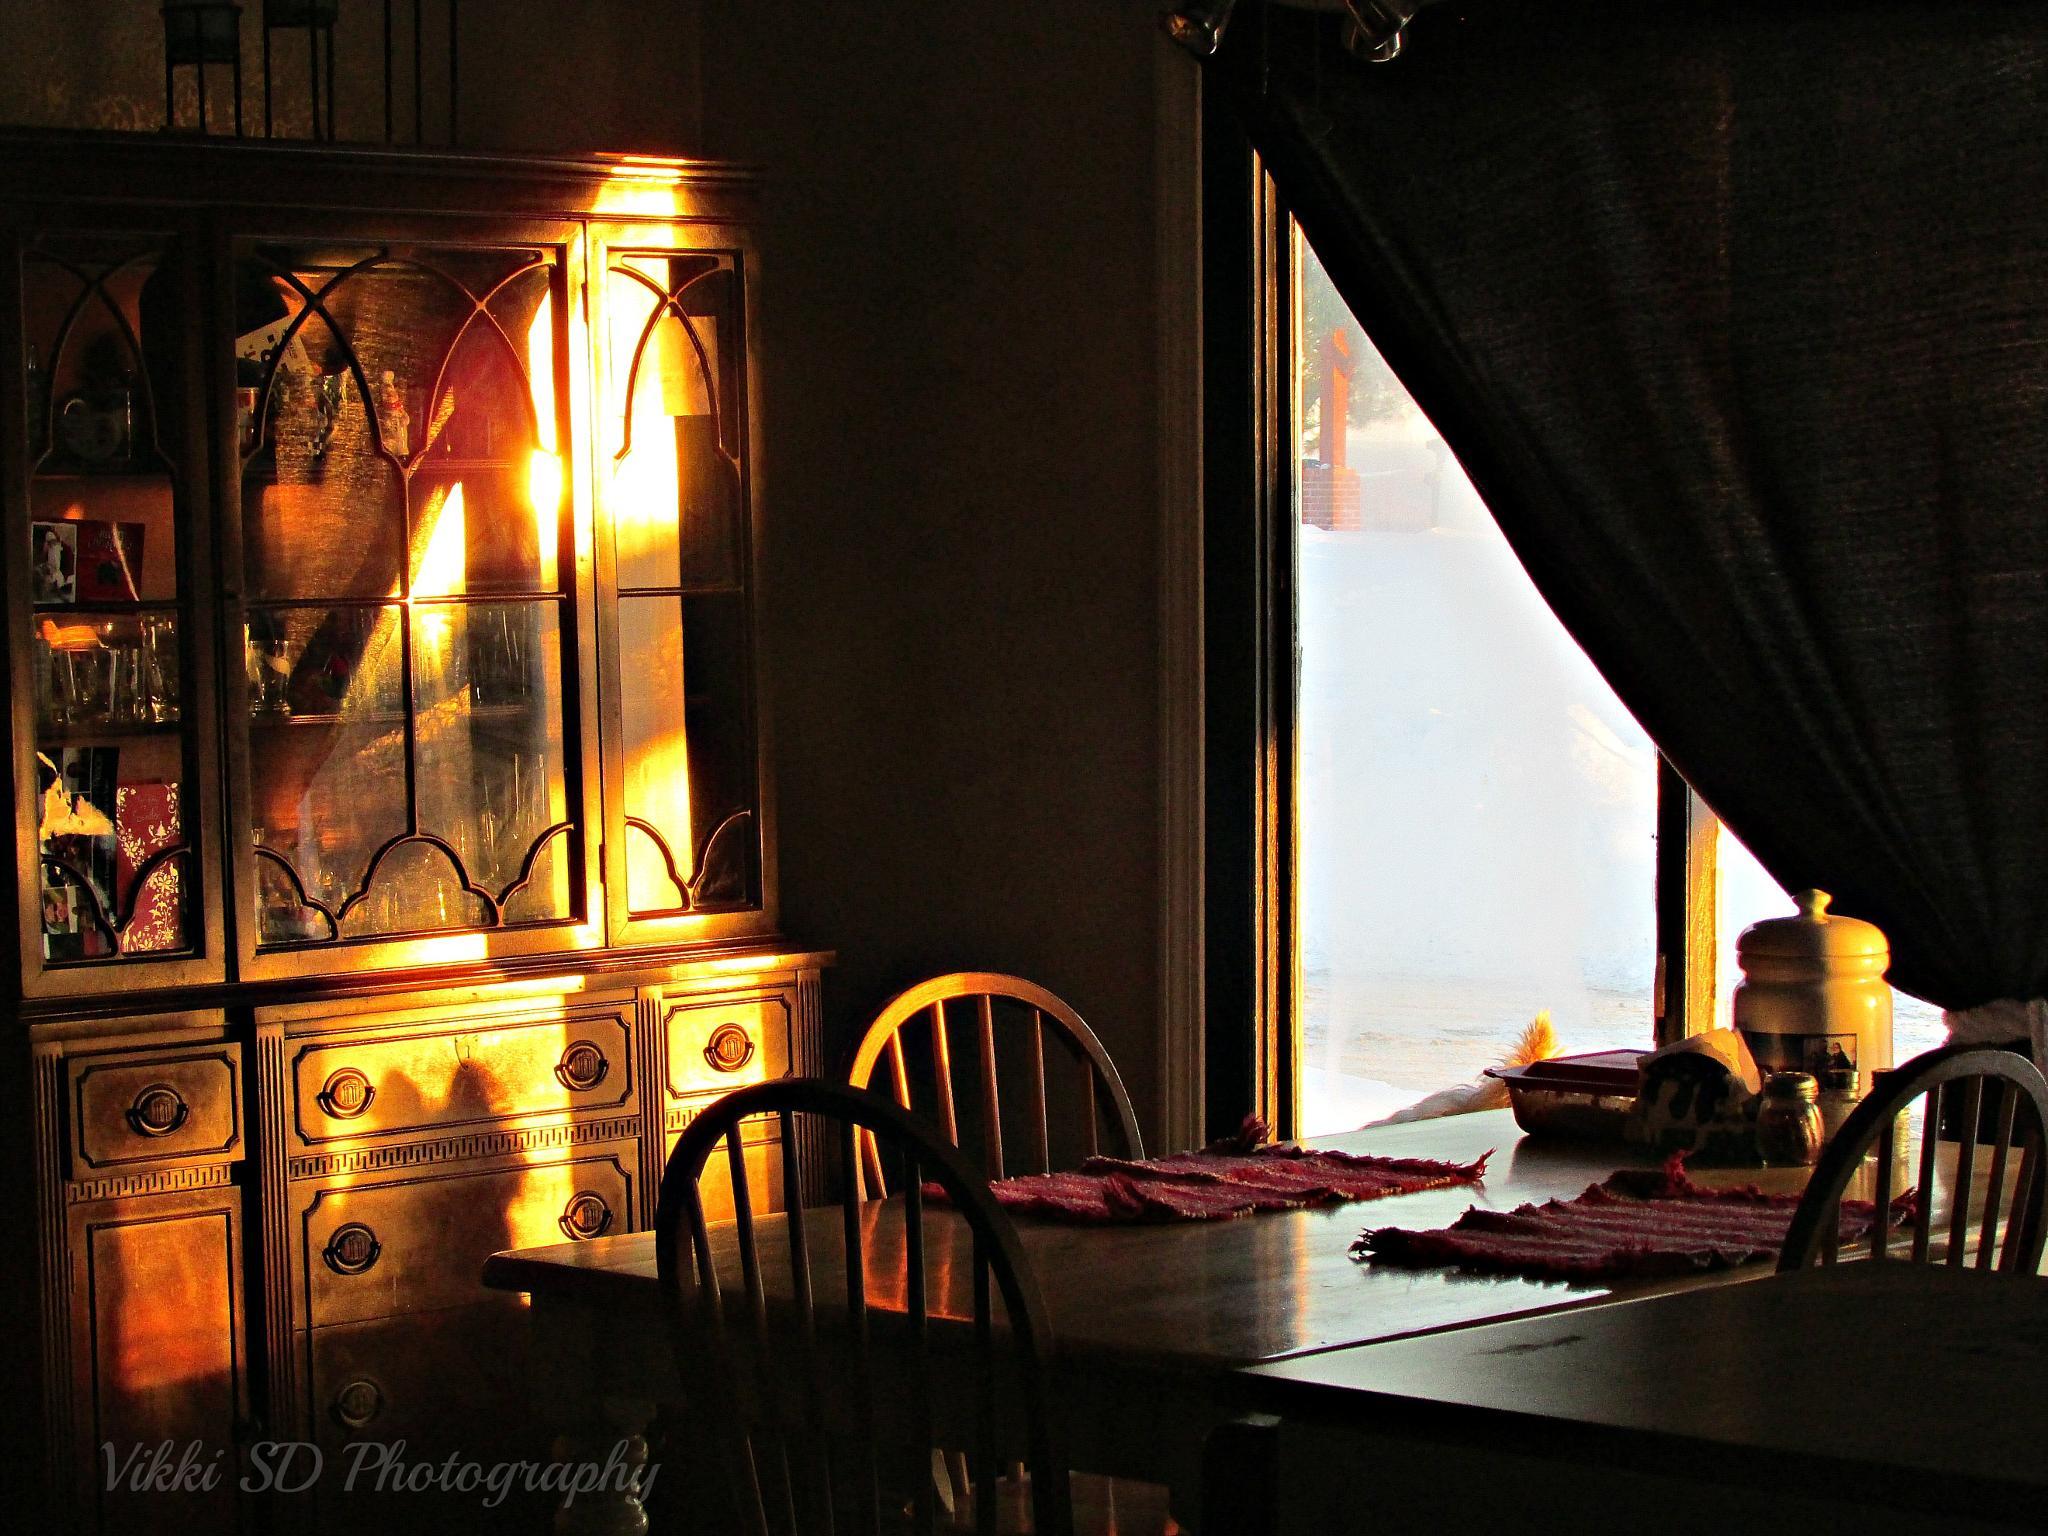 Silhouette by Vikki Schifano